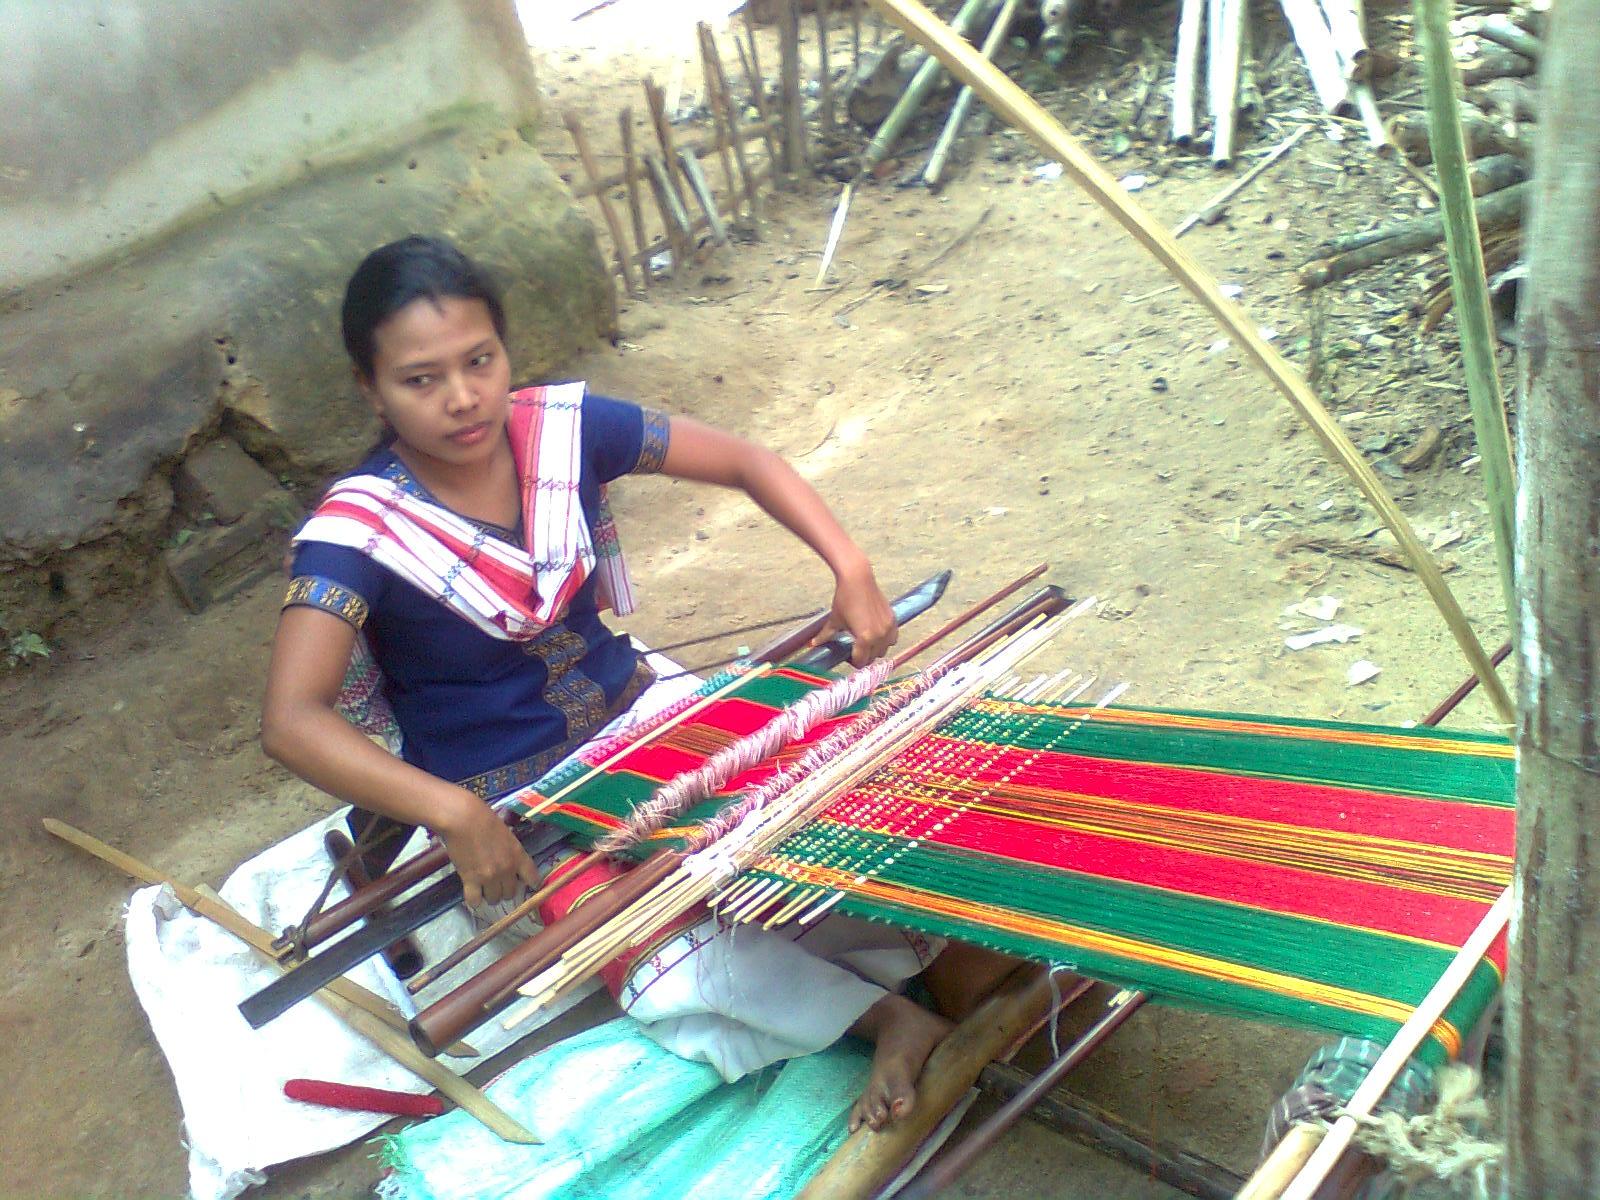 File:Tripura Woman With Her Handloom, Srimangal, 2010 by Biplob